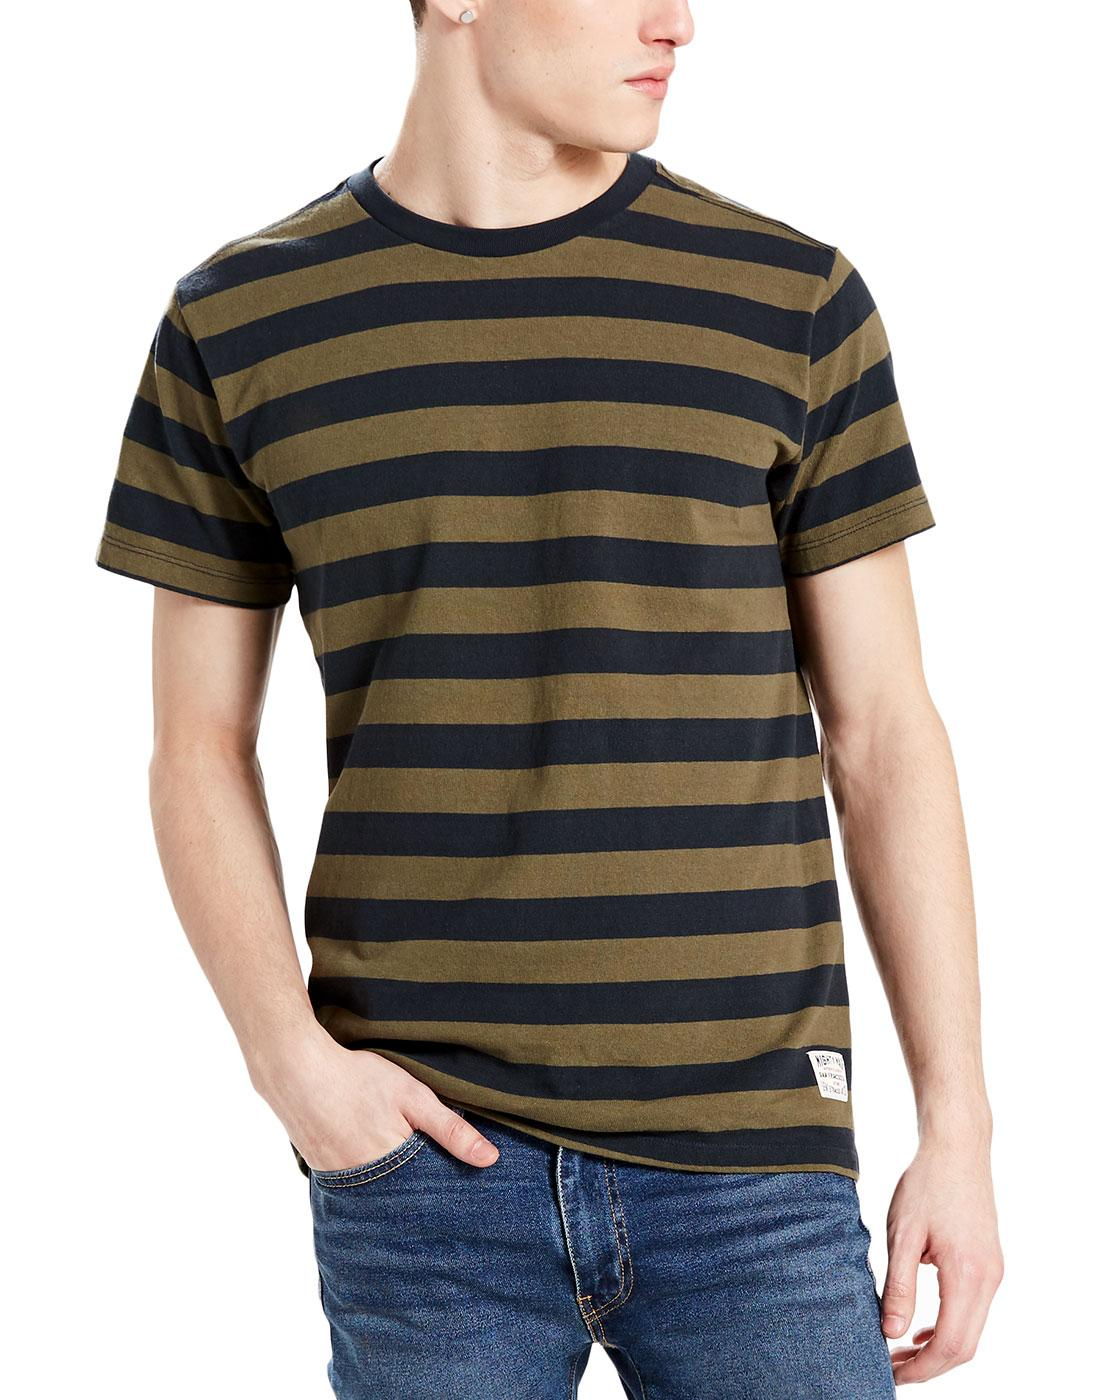 Mighty LEVI'S Retro Mod Bass Stripe T-Shirt OLIVE